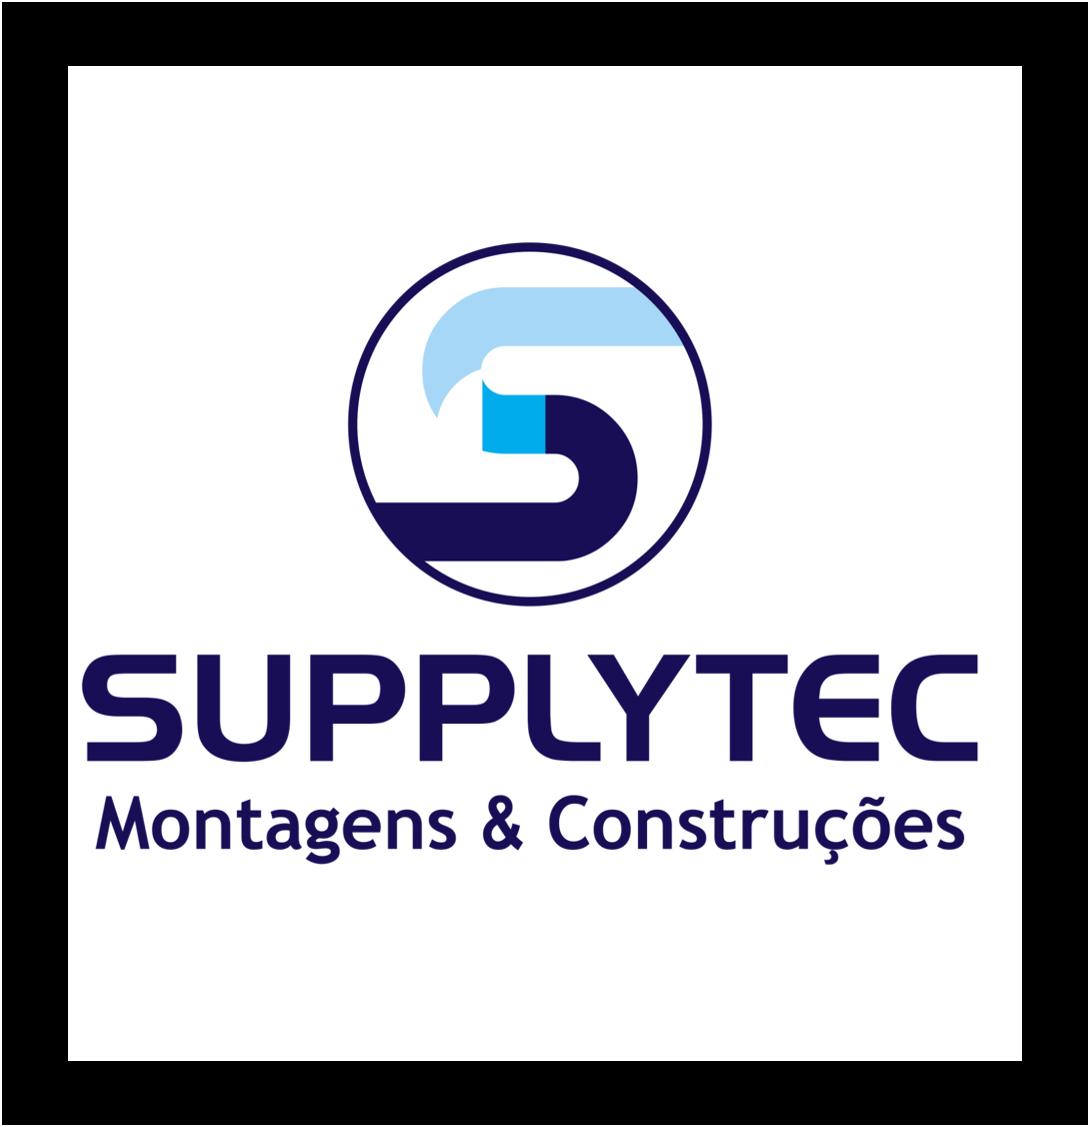 Supplytec